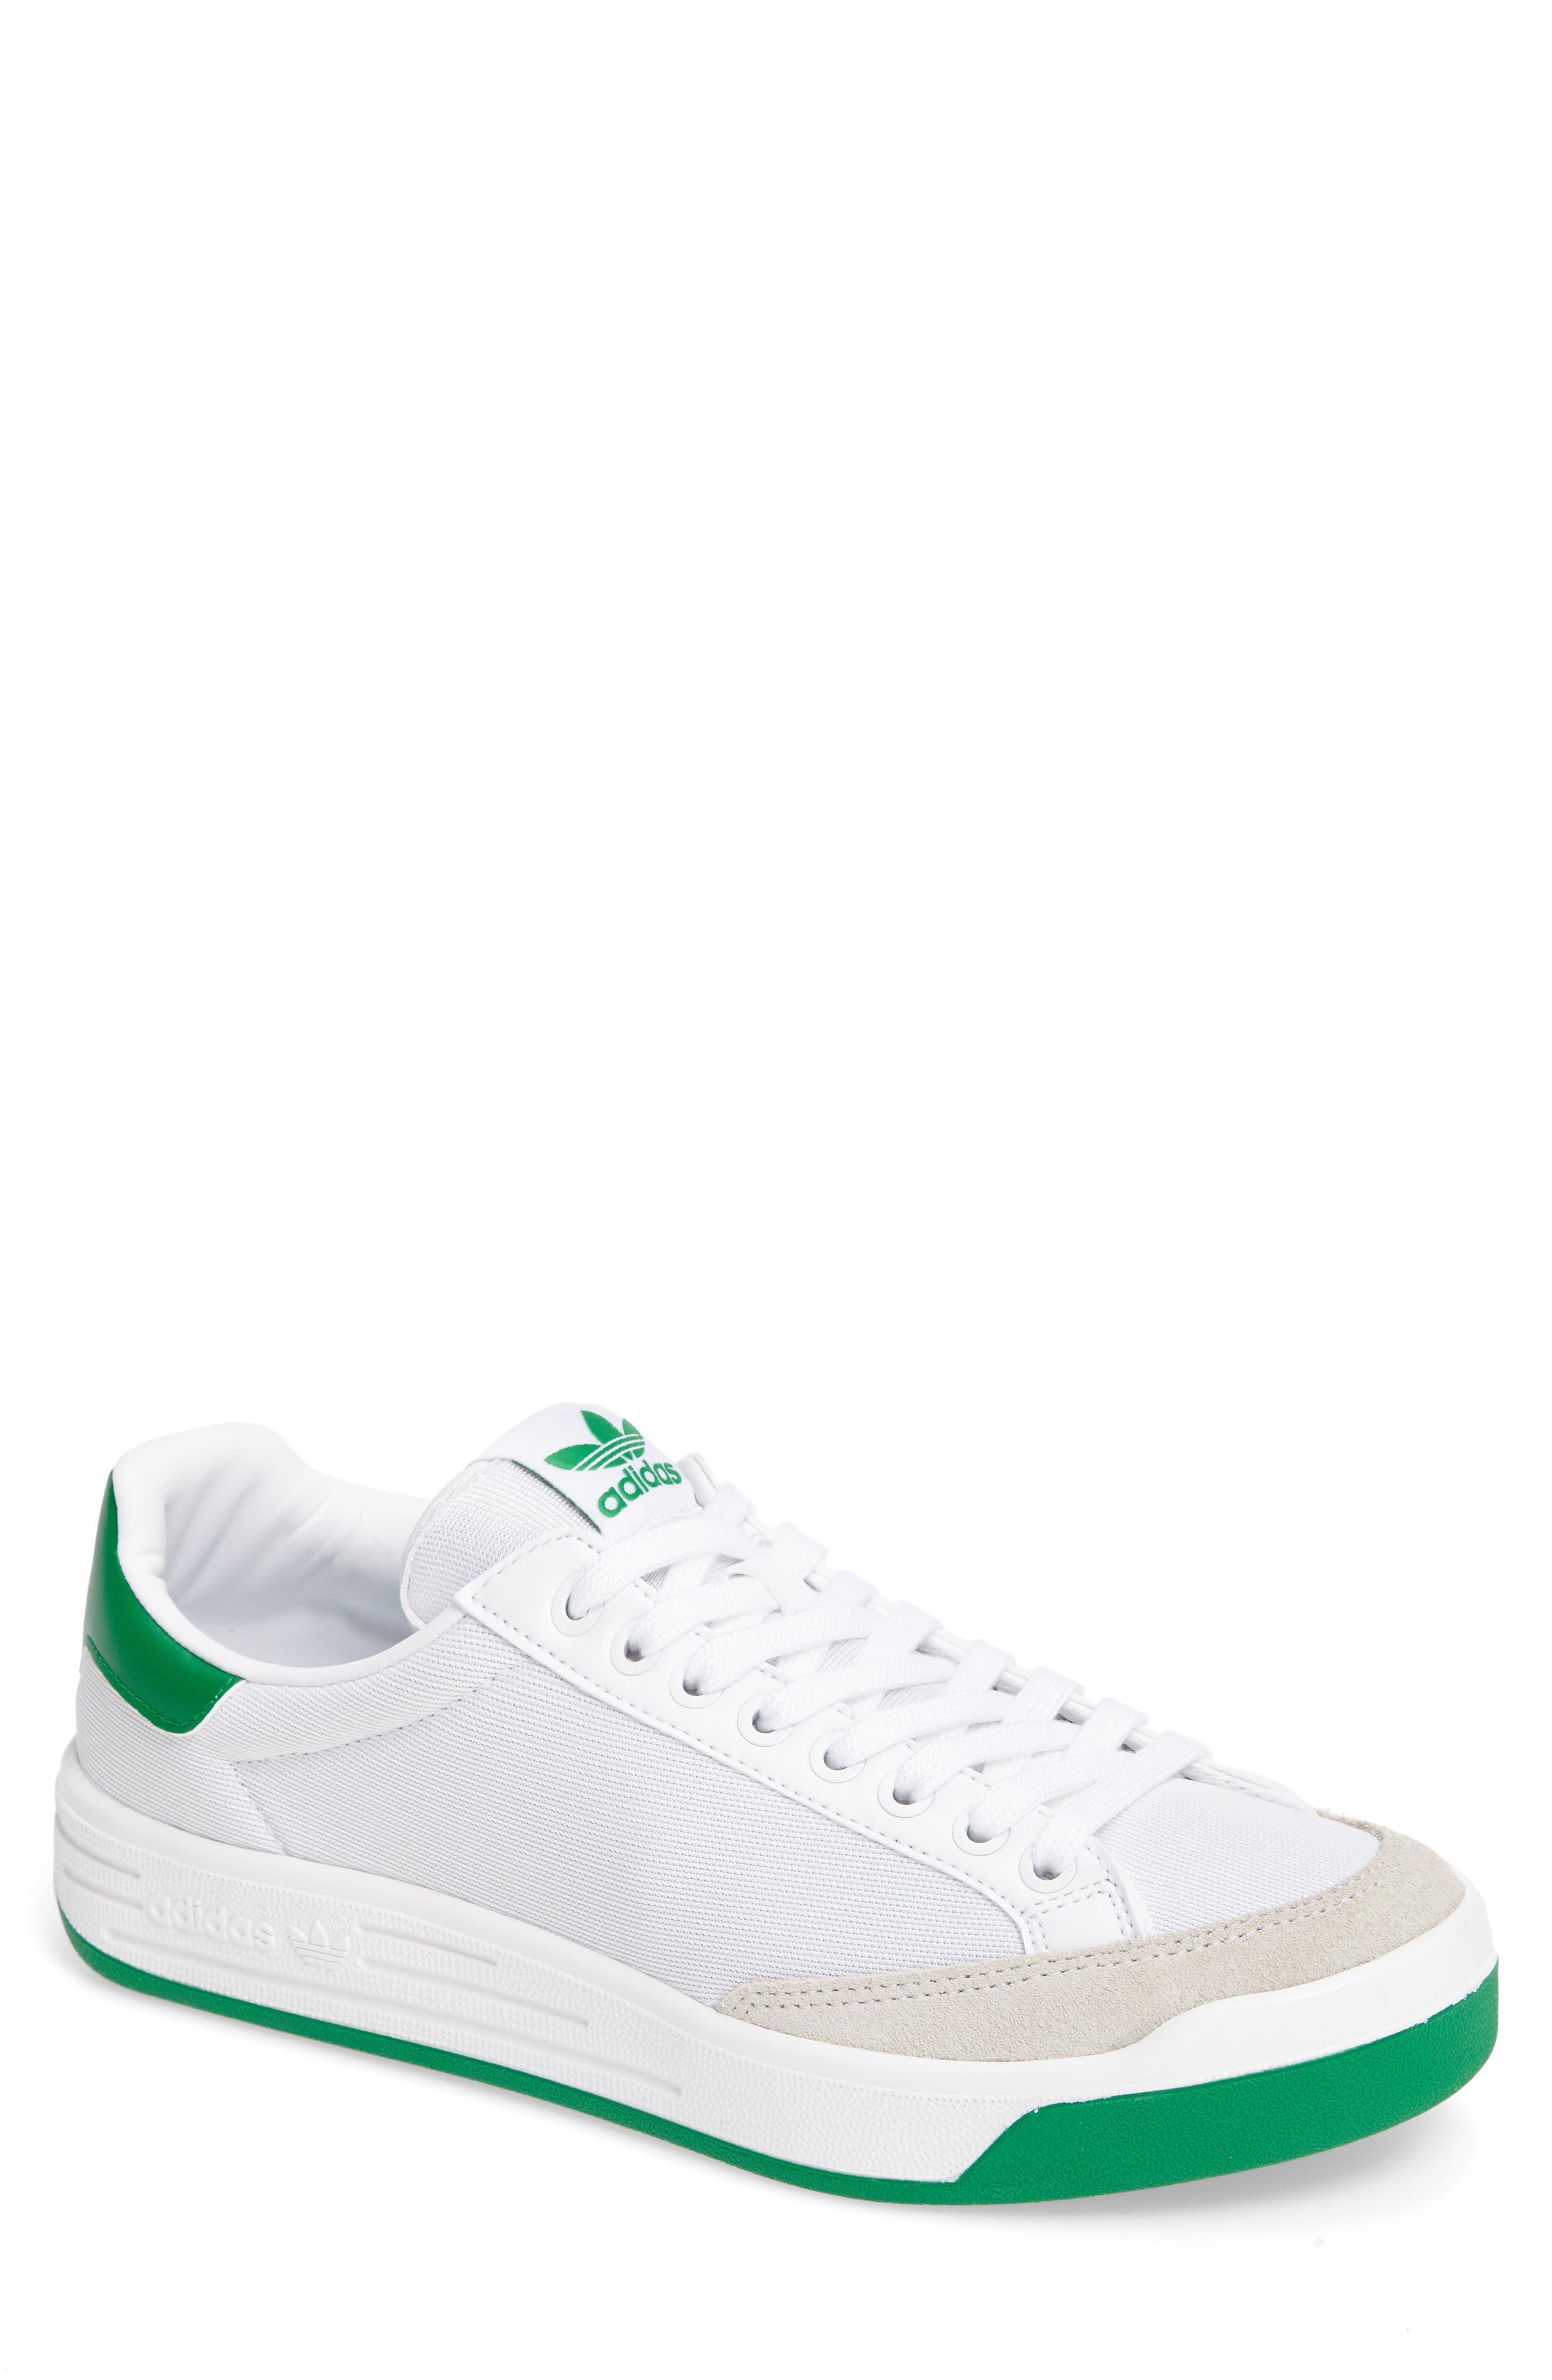 ADIDAS Rod Laver Super Sneaker, Main, color, 100